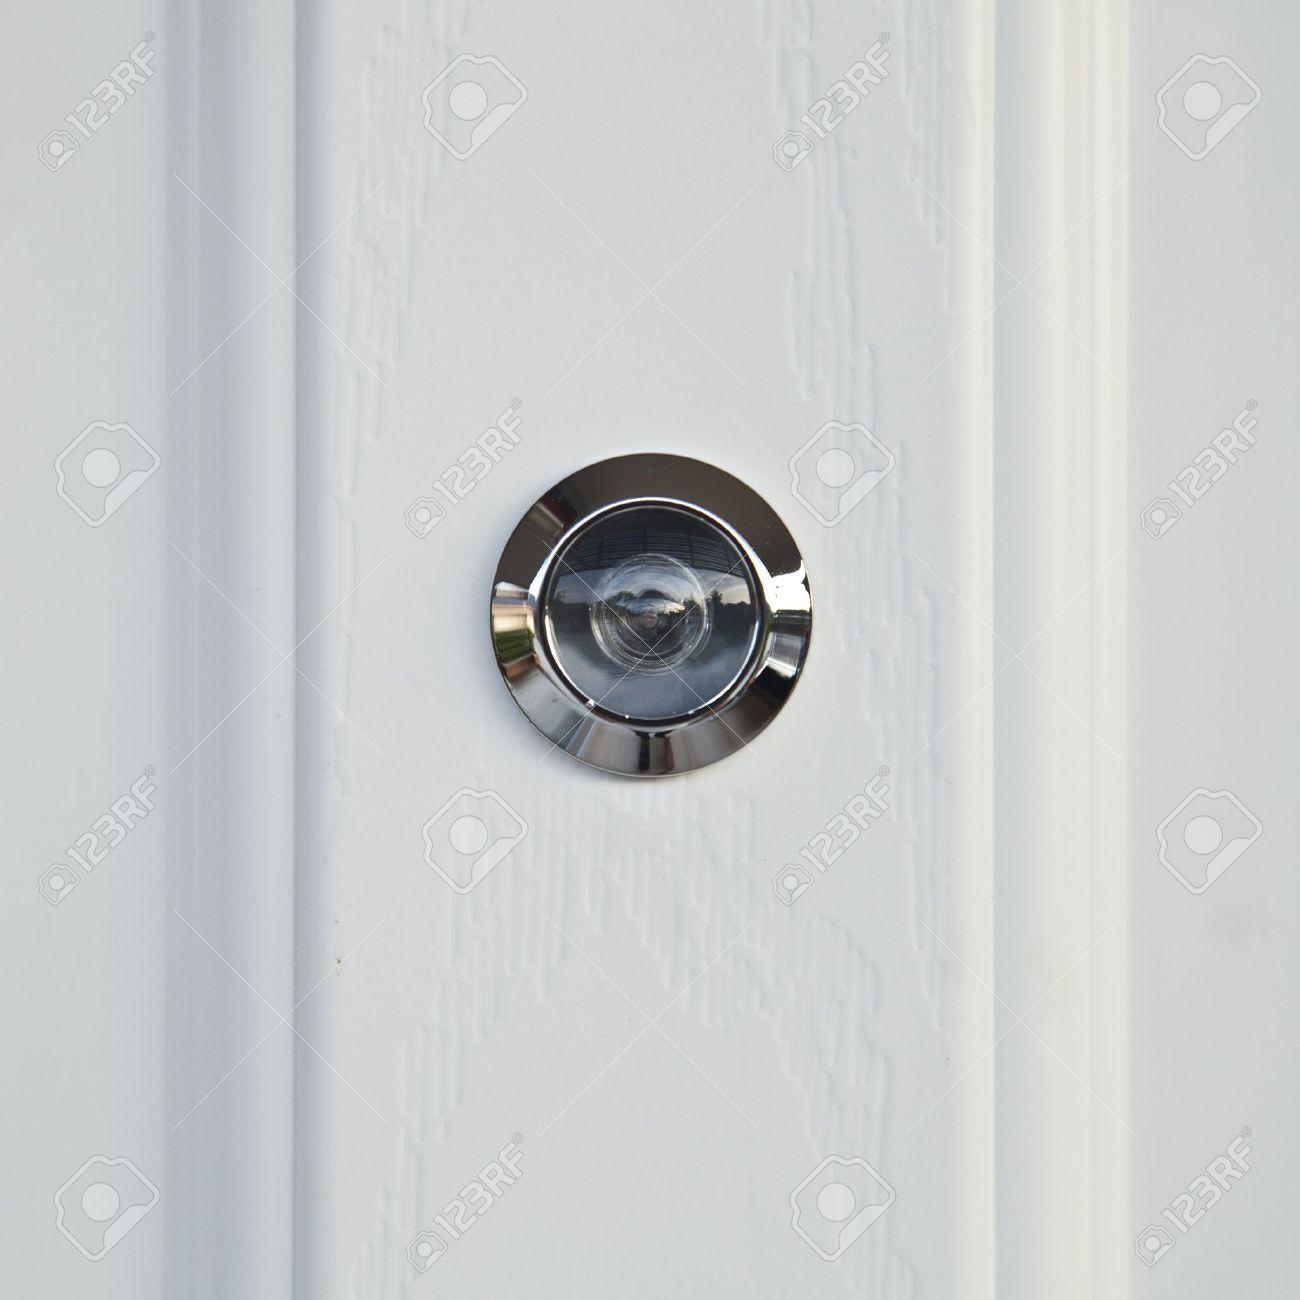 White Wood Door Texture close up, door lens peephole on white wooden texture stock photo